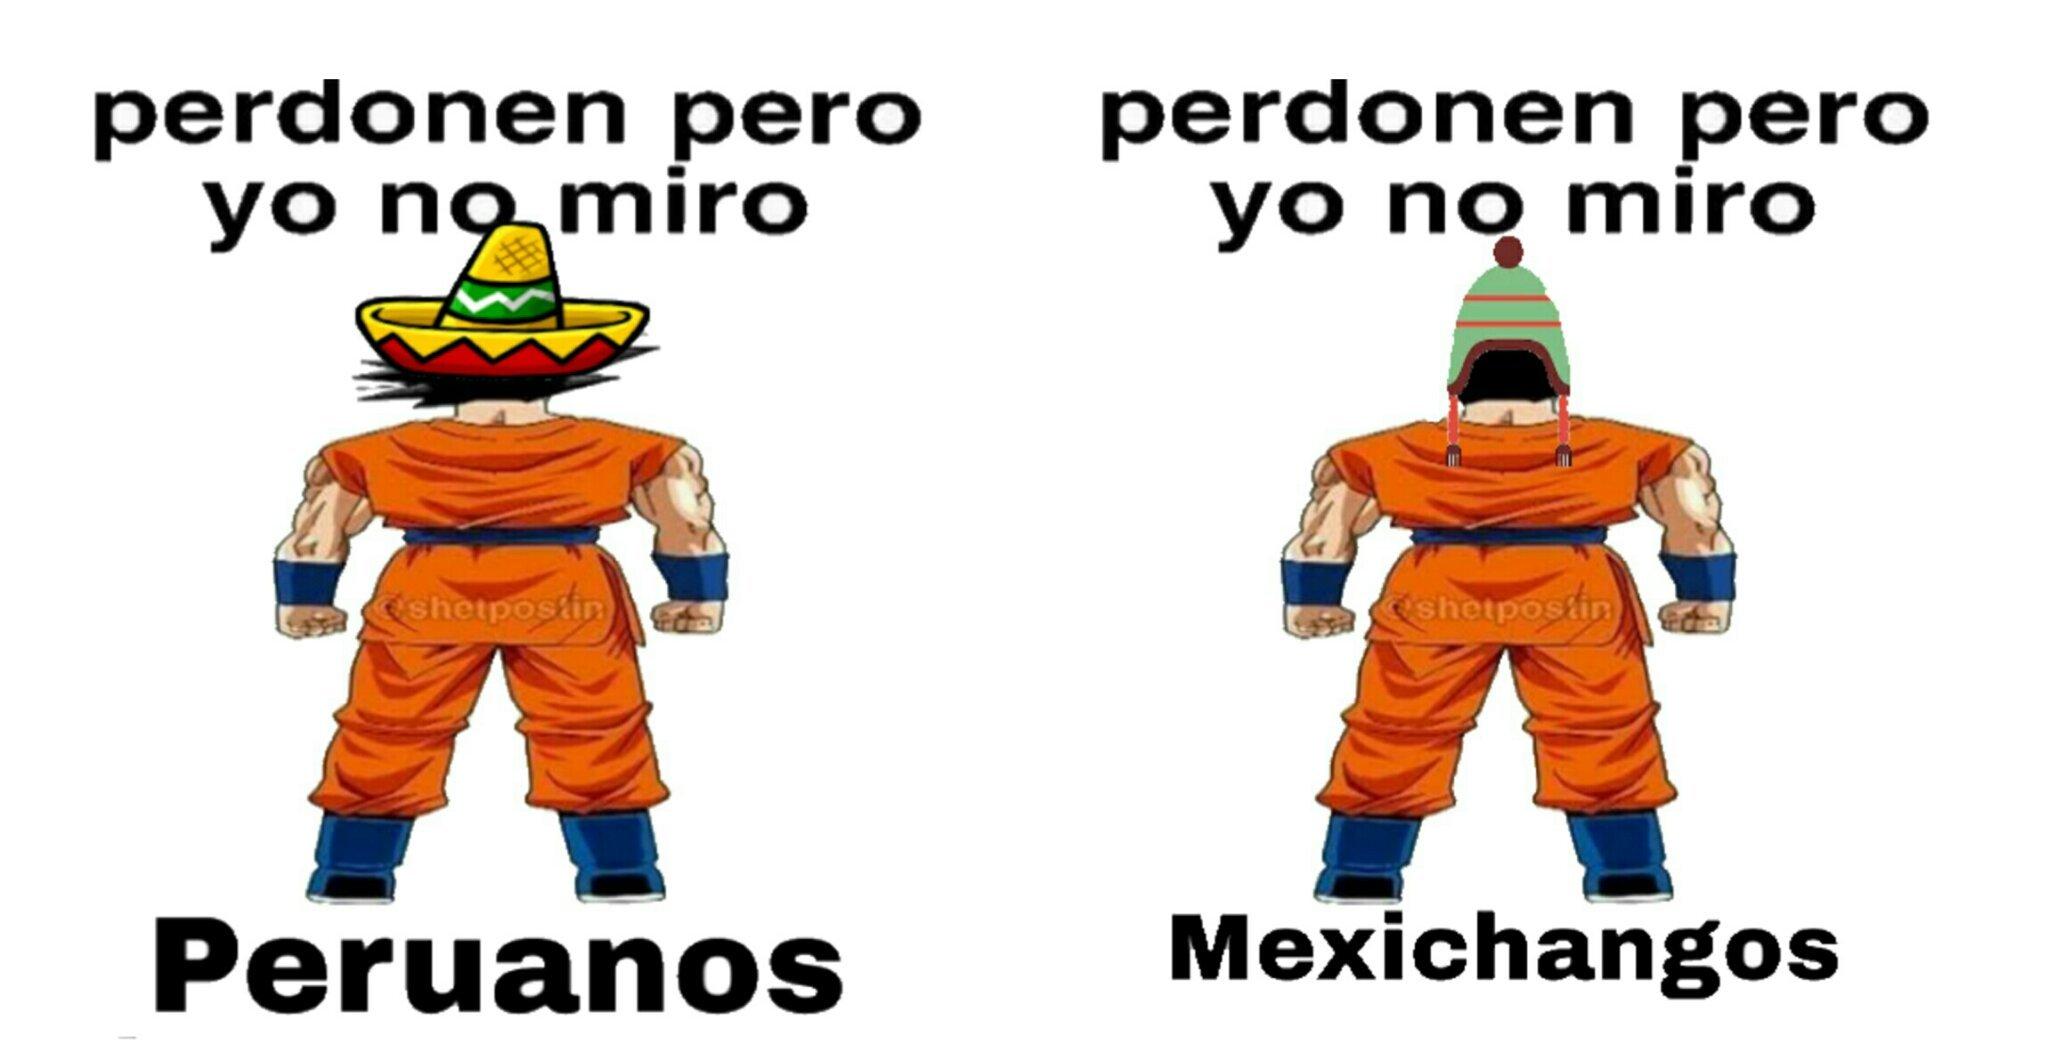 XDDDDDDDDDDDDDDDDDDDDDDDDD - meme